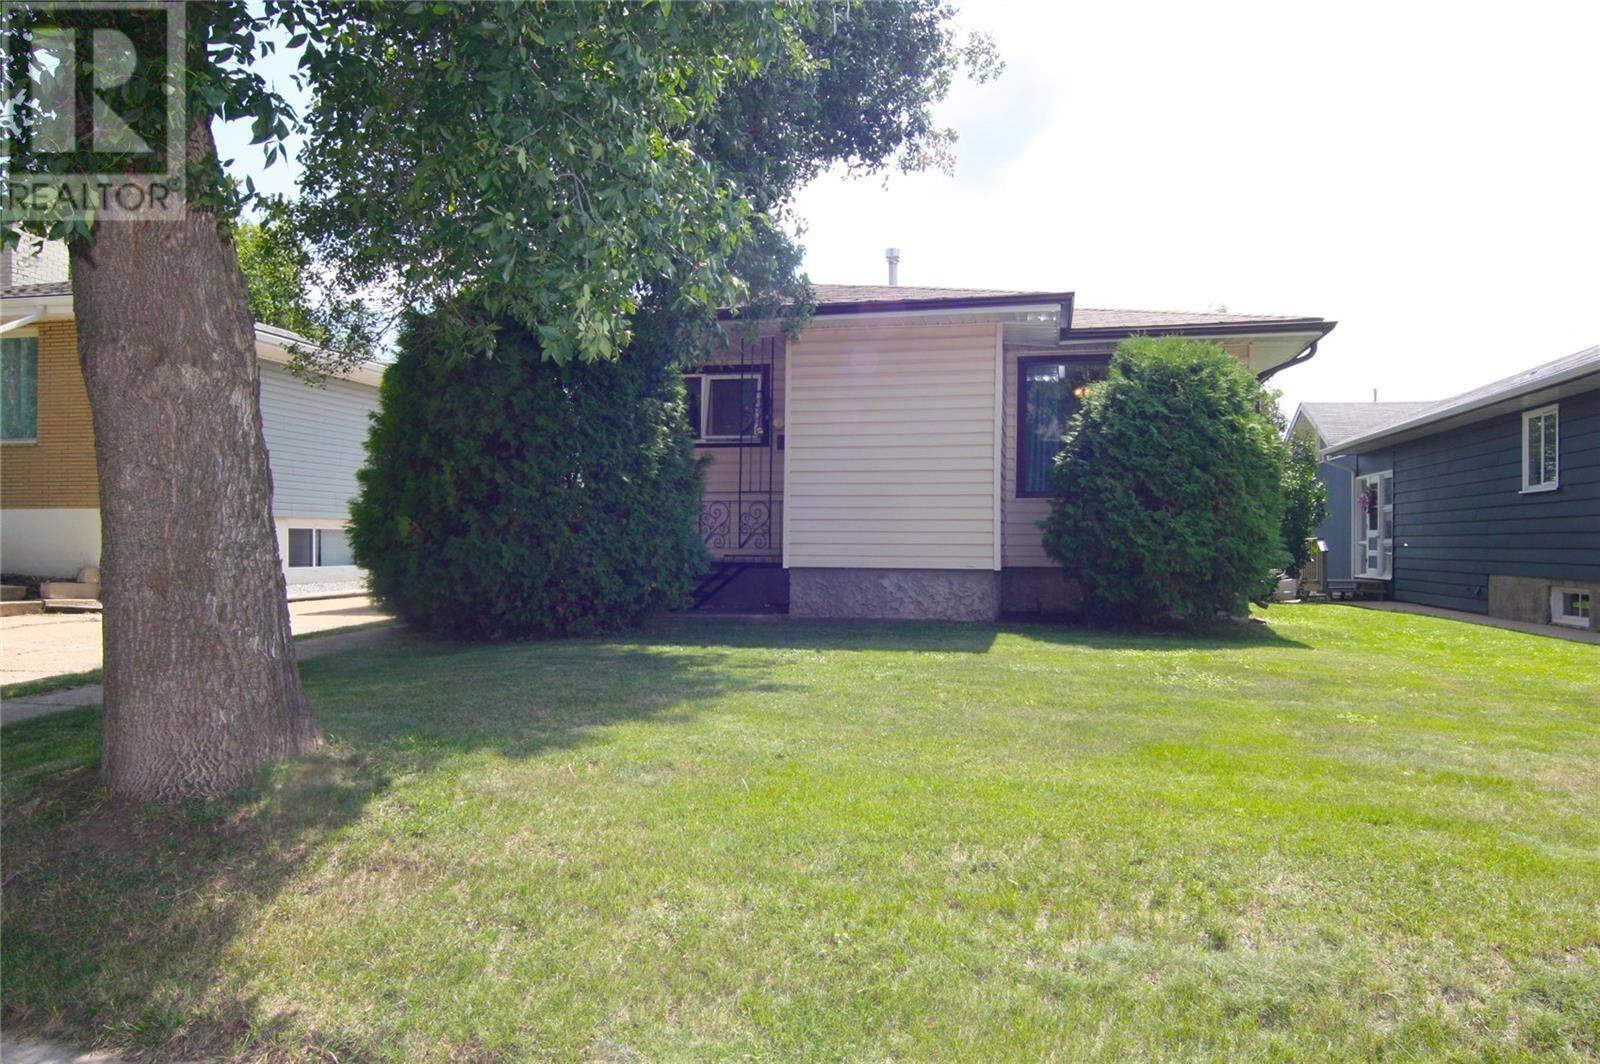 House for sale at 537 22nd St W Prince Albert Saskatchewan - MLS: SK783147